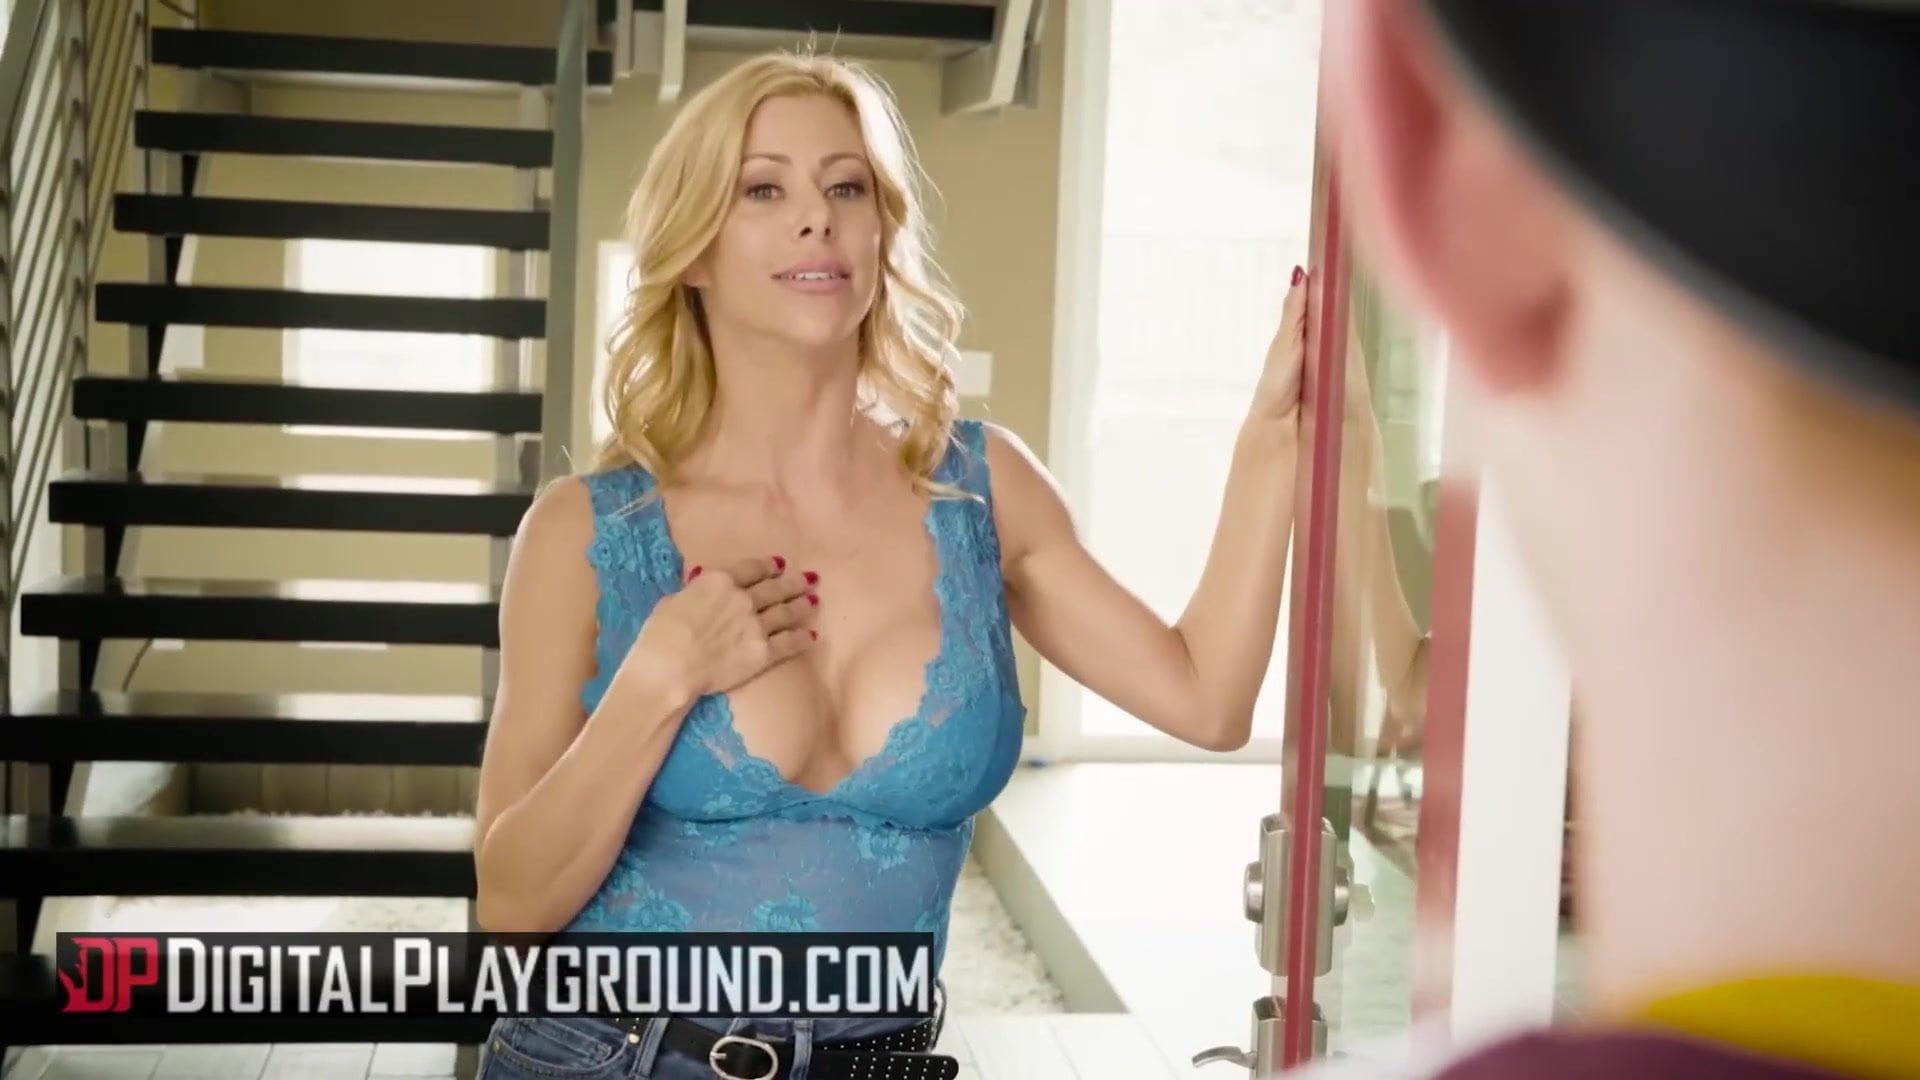 Hot blonde wife Aline wants her favorite breakfast: sausage